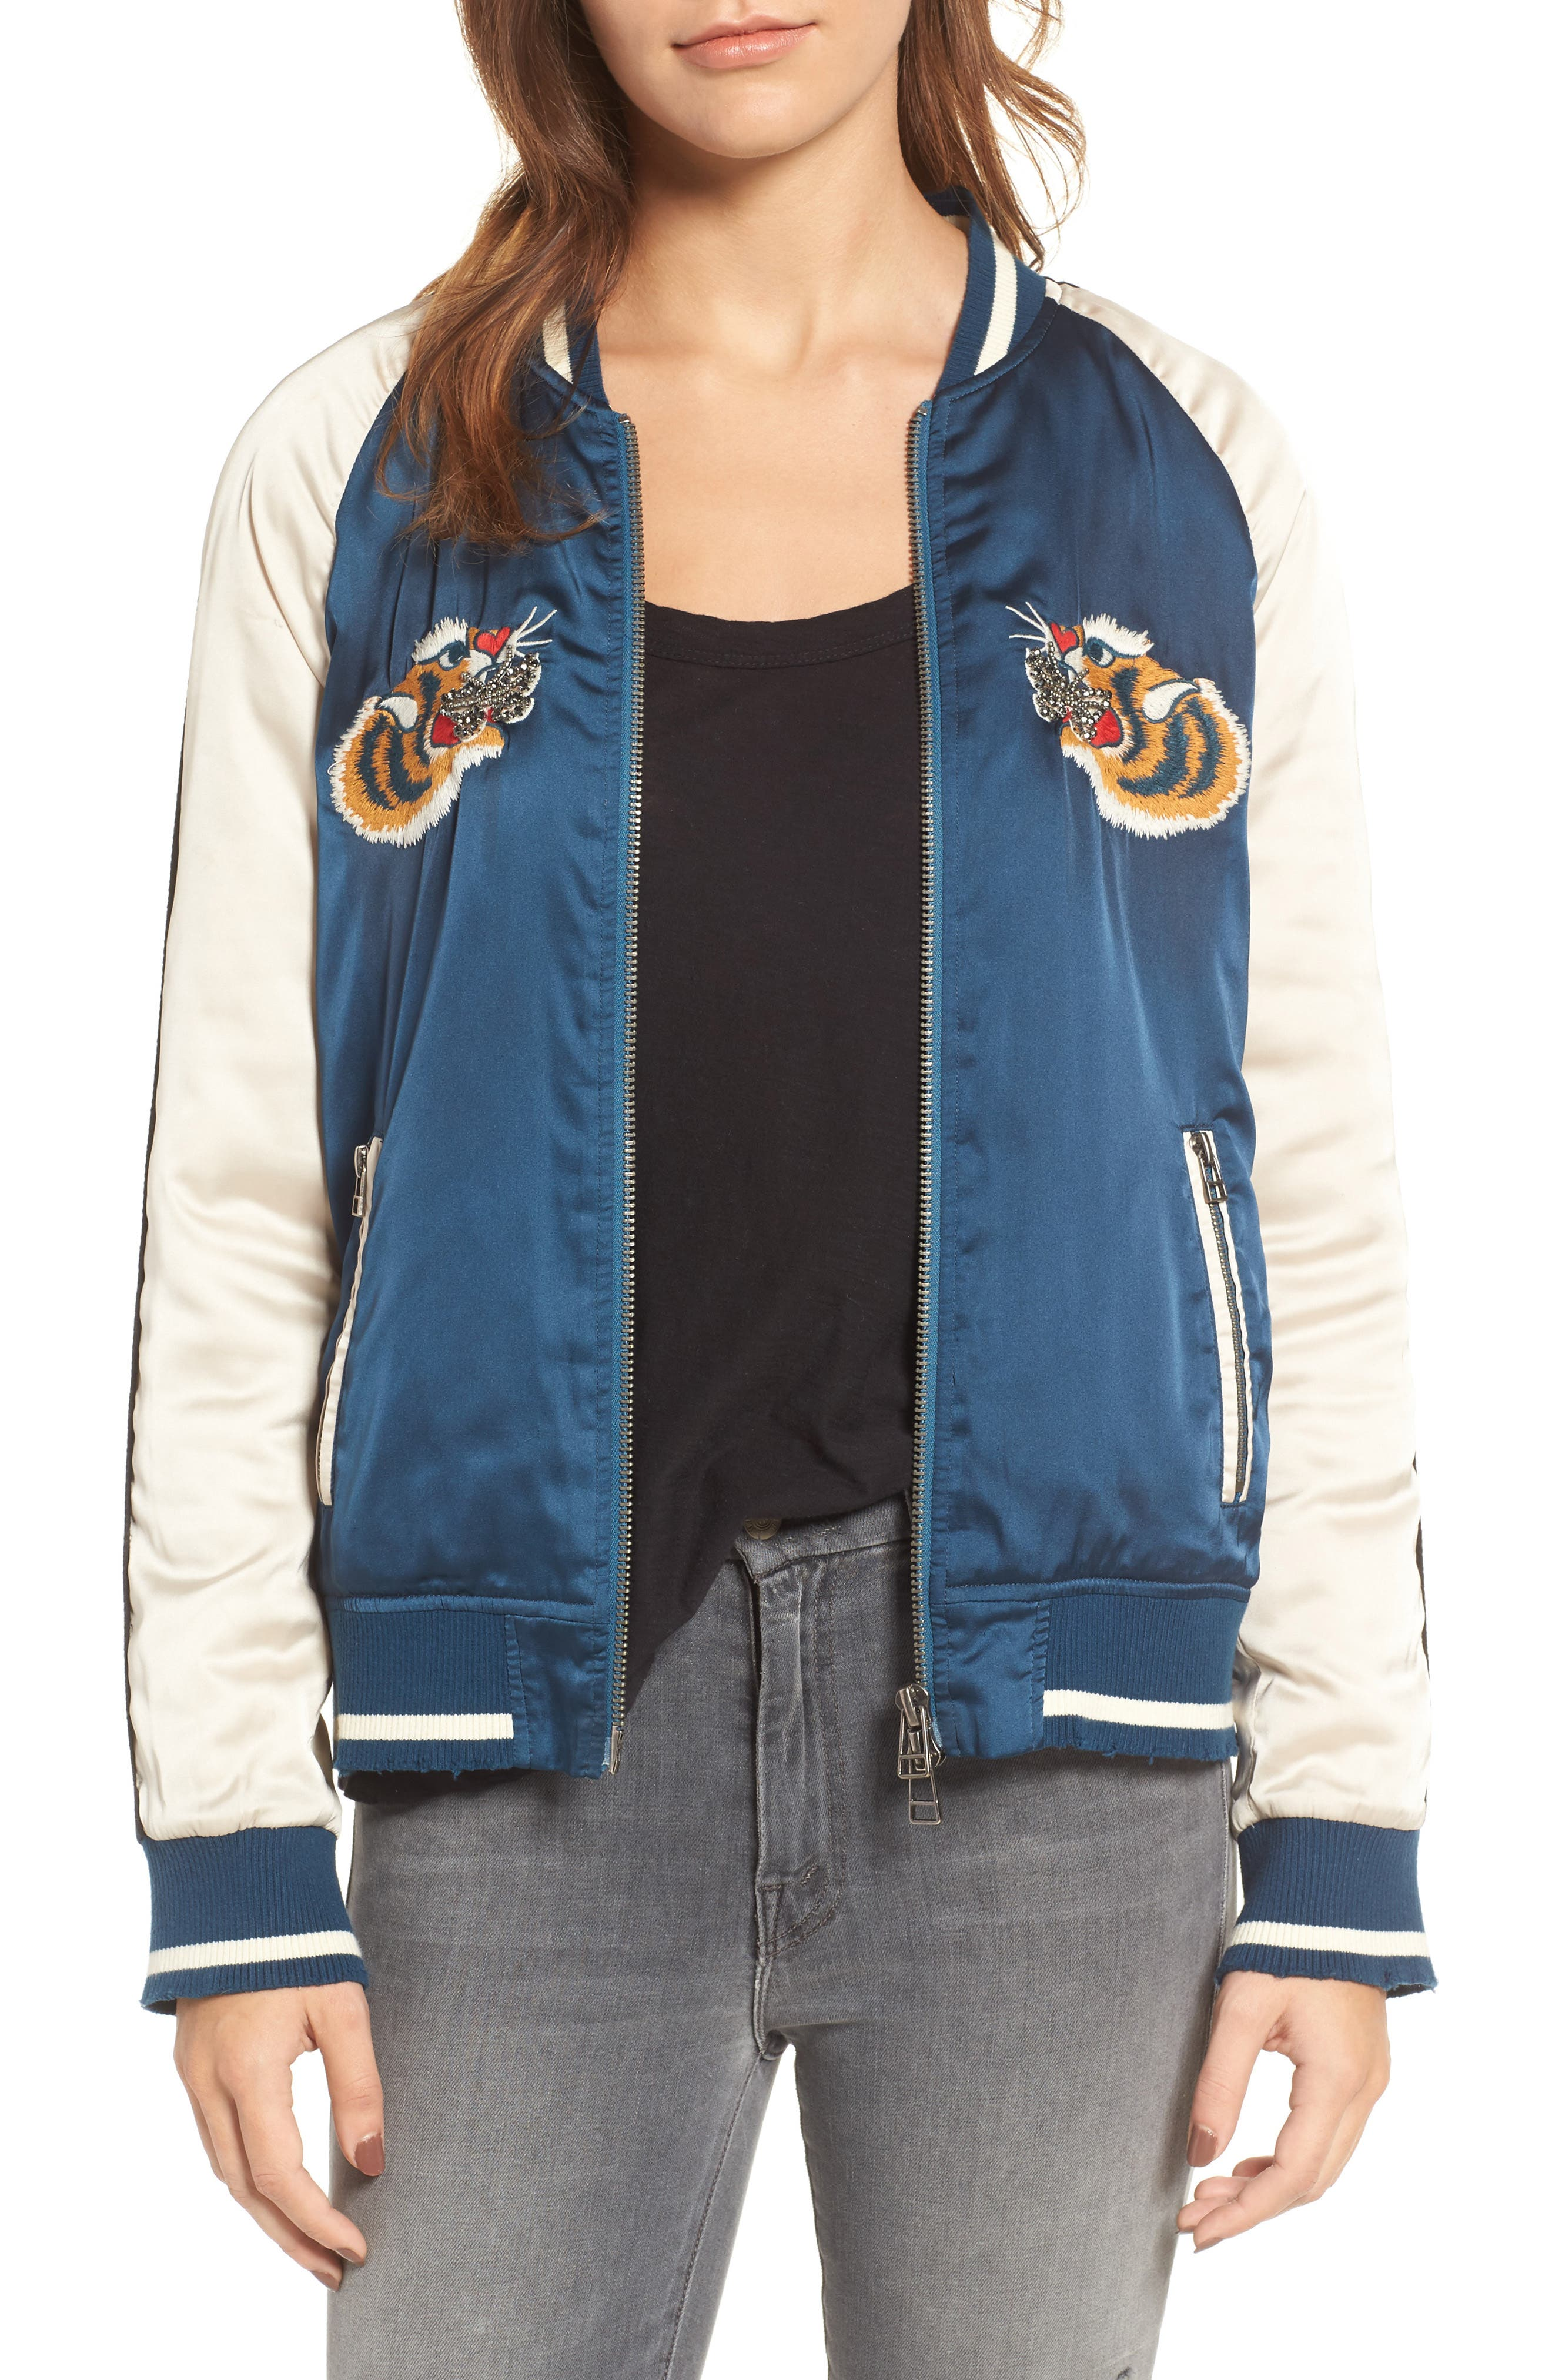 Alternate Image 1 Selected - Pam & Gela Embroidered Satin Bomber Jacket